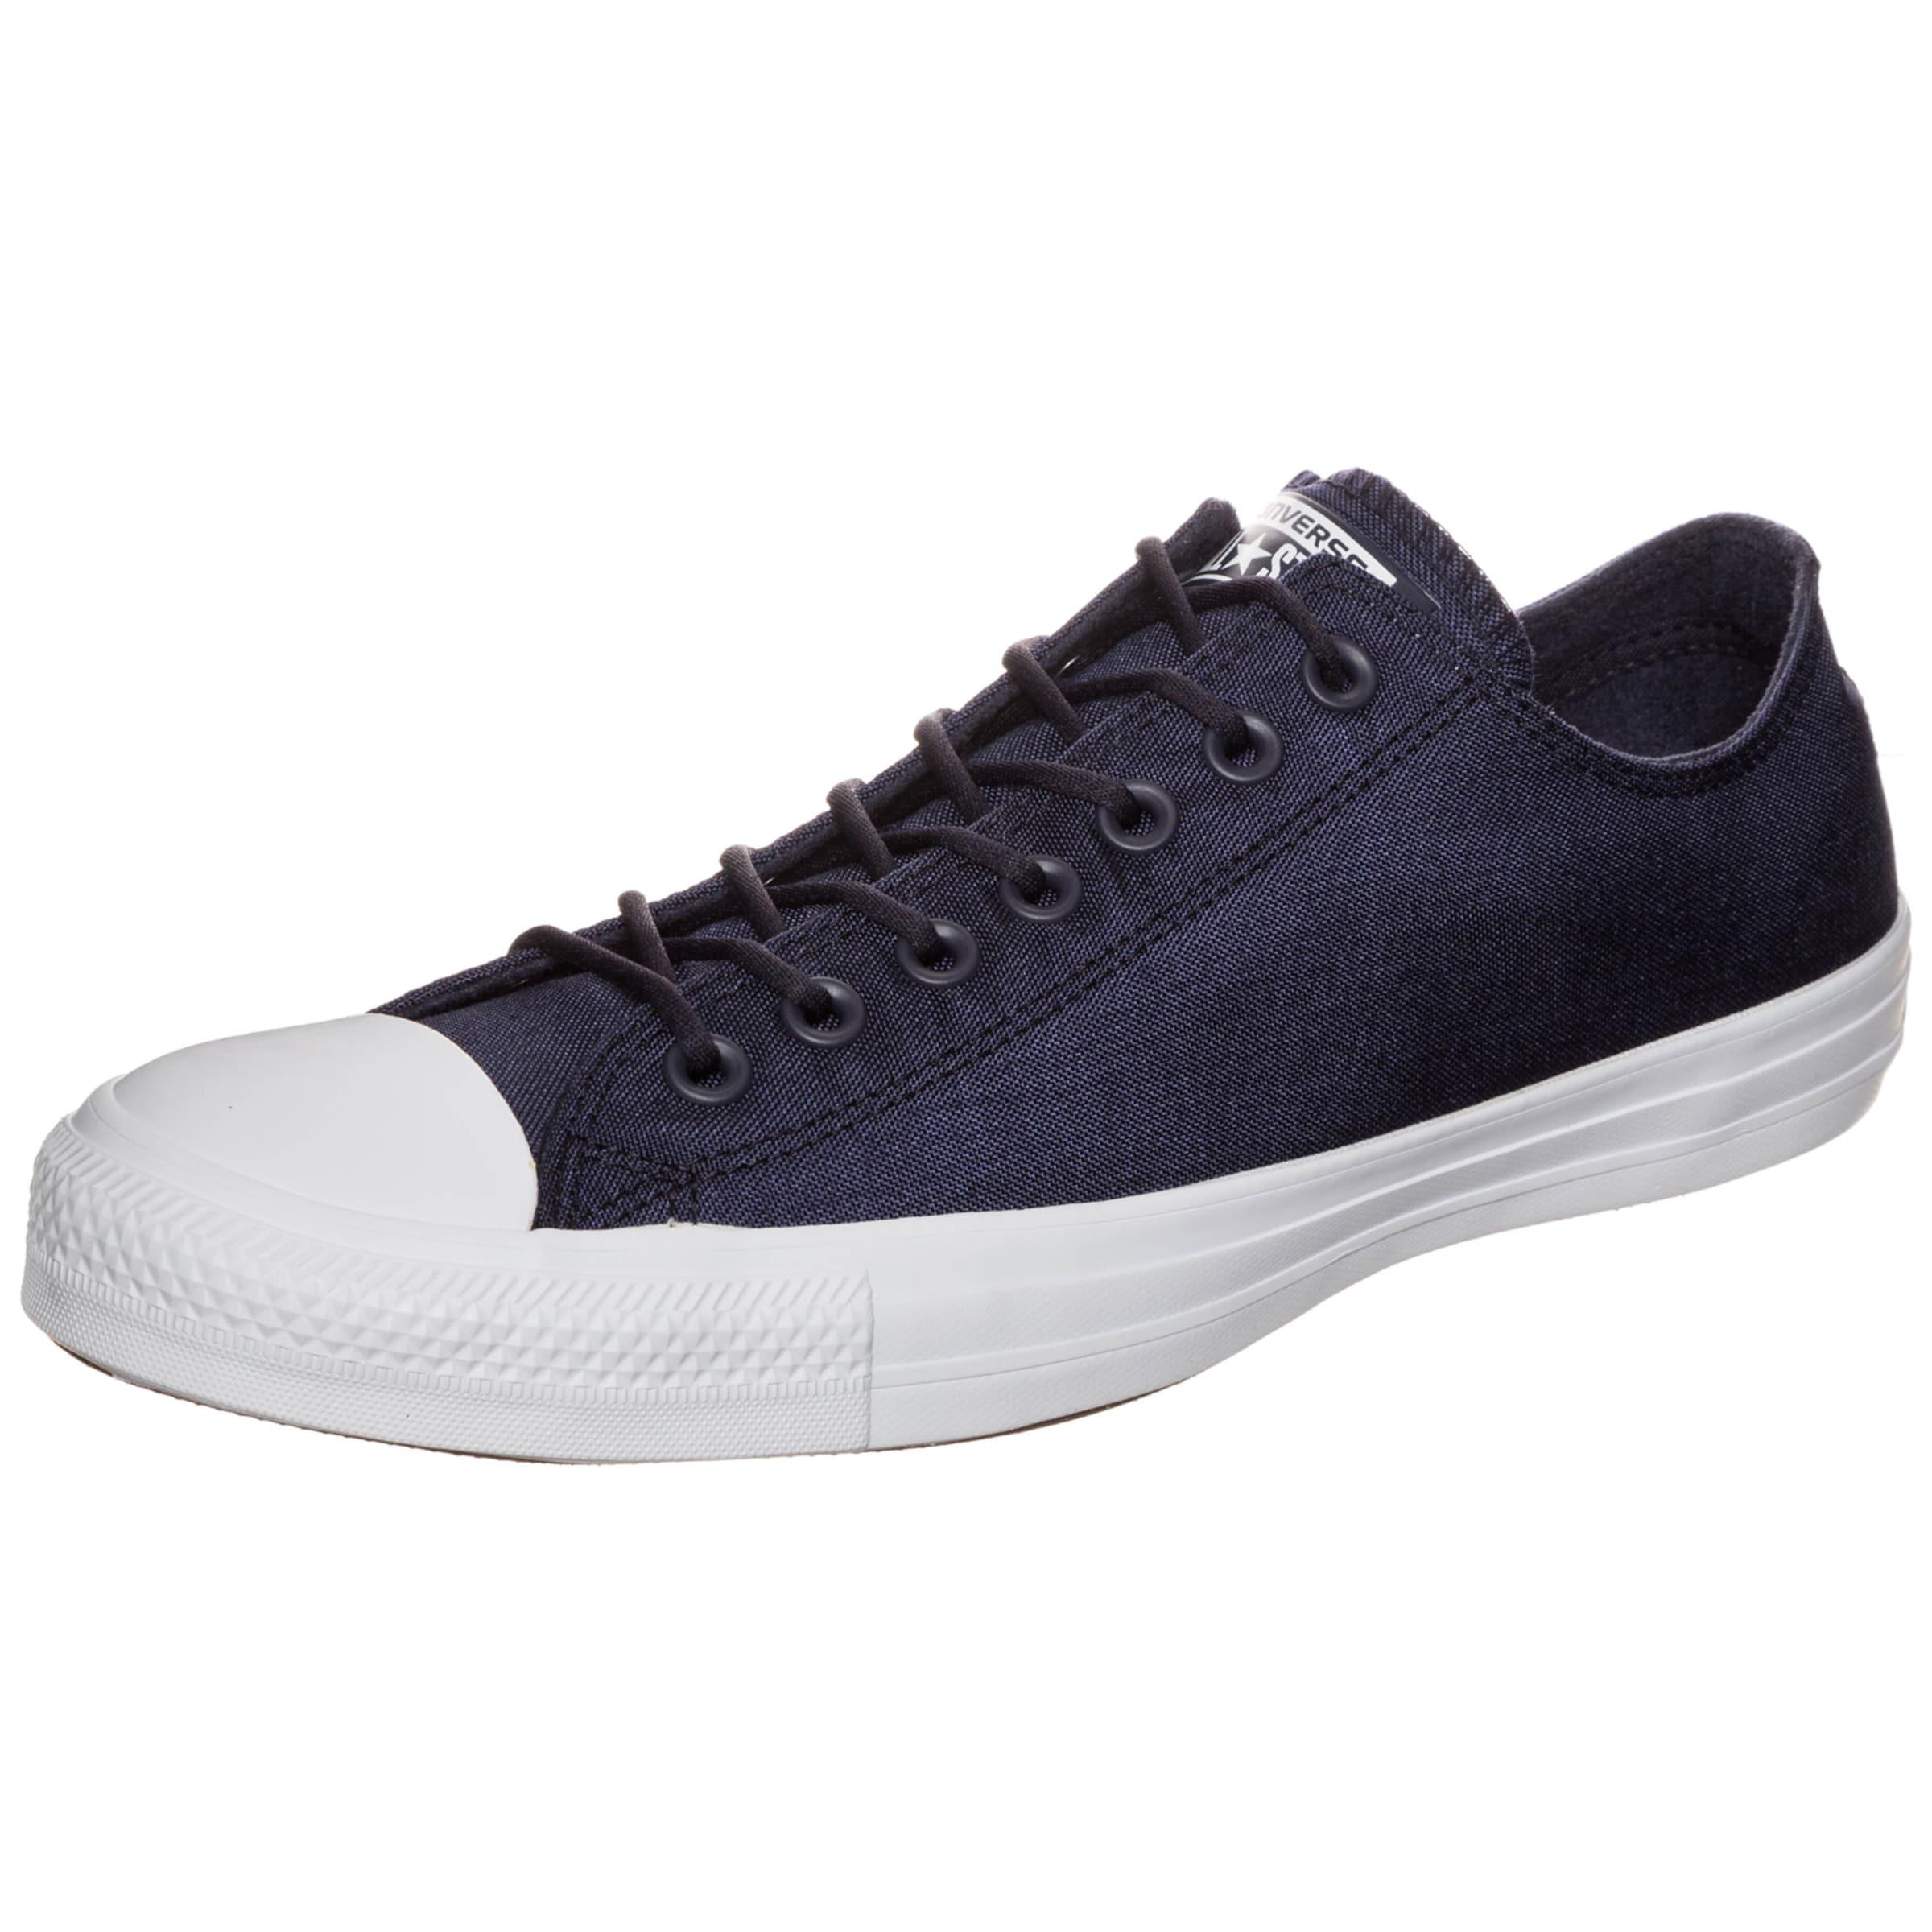 Star All Ox' In Taylor 'chuck Sneaker Converse BlauDunkelblau Herren 5RLj34A